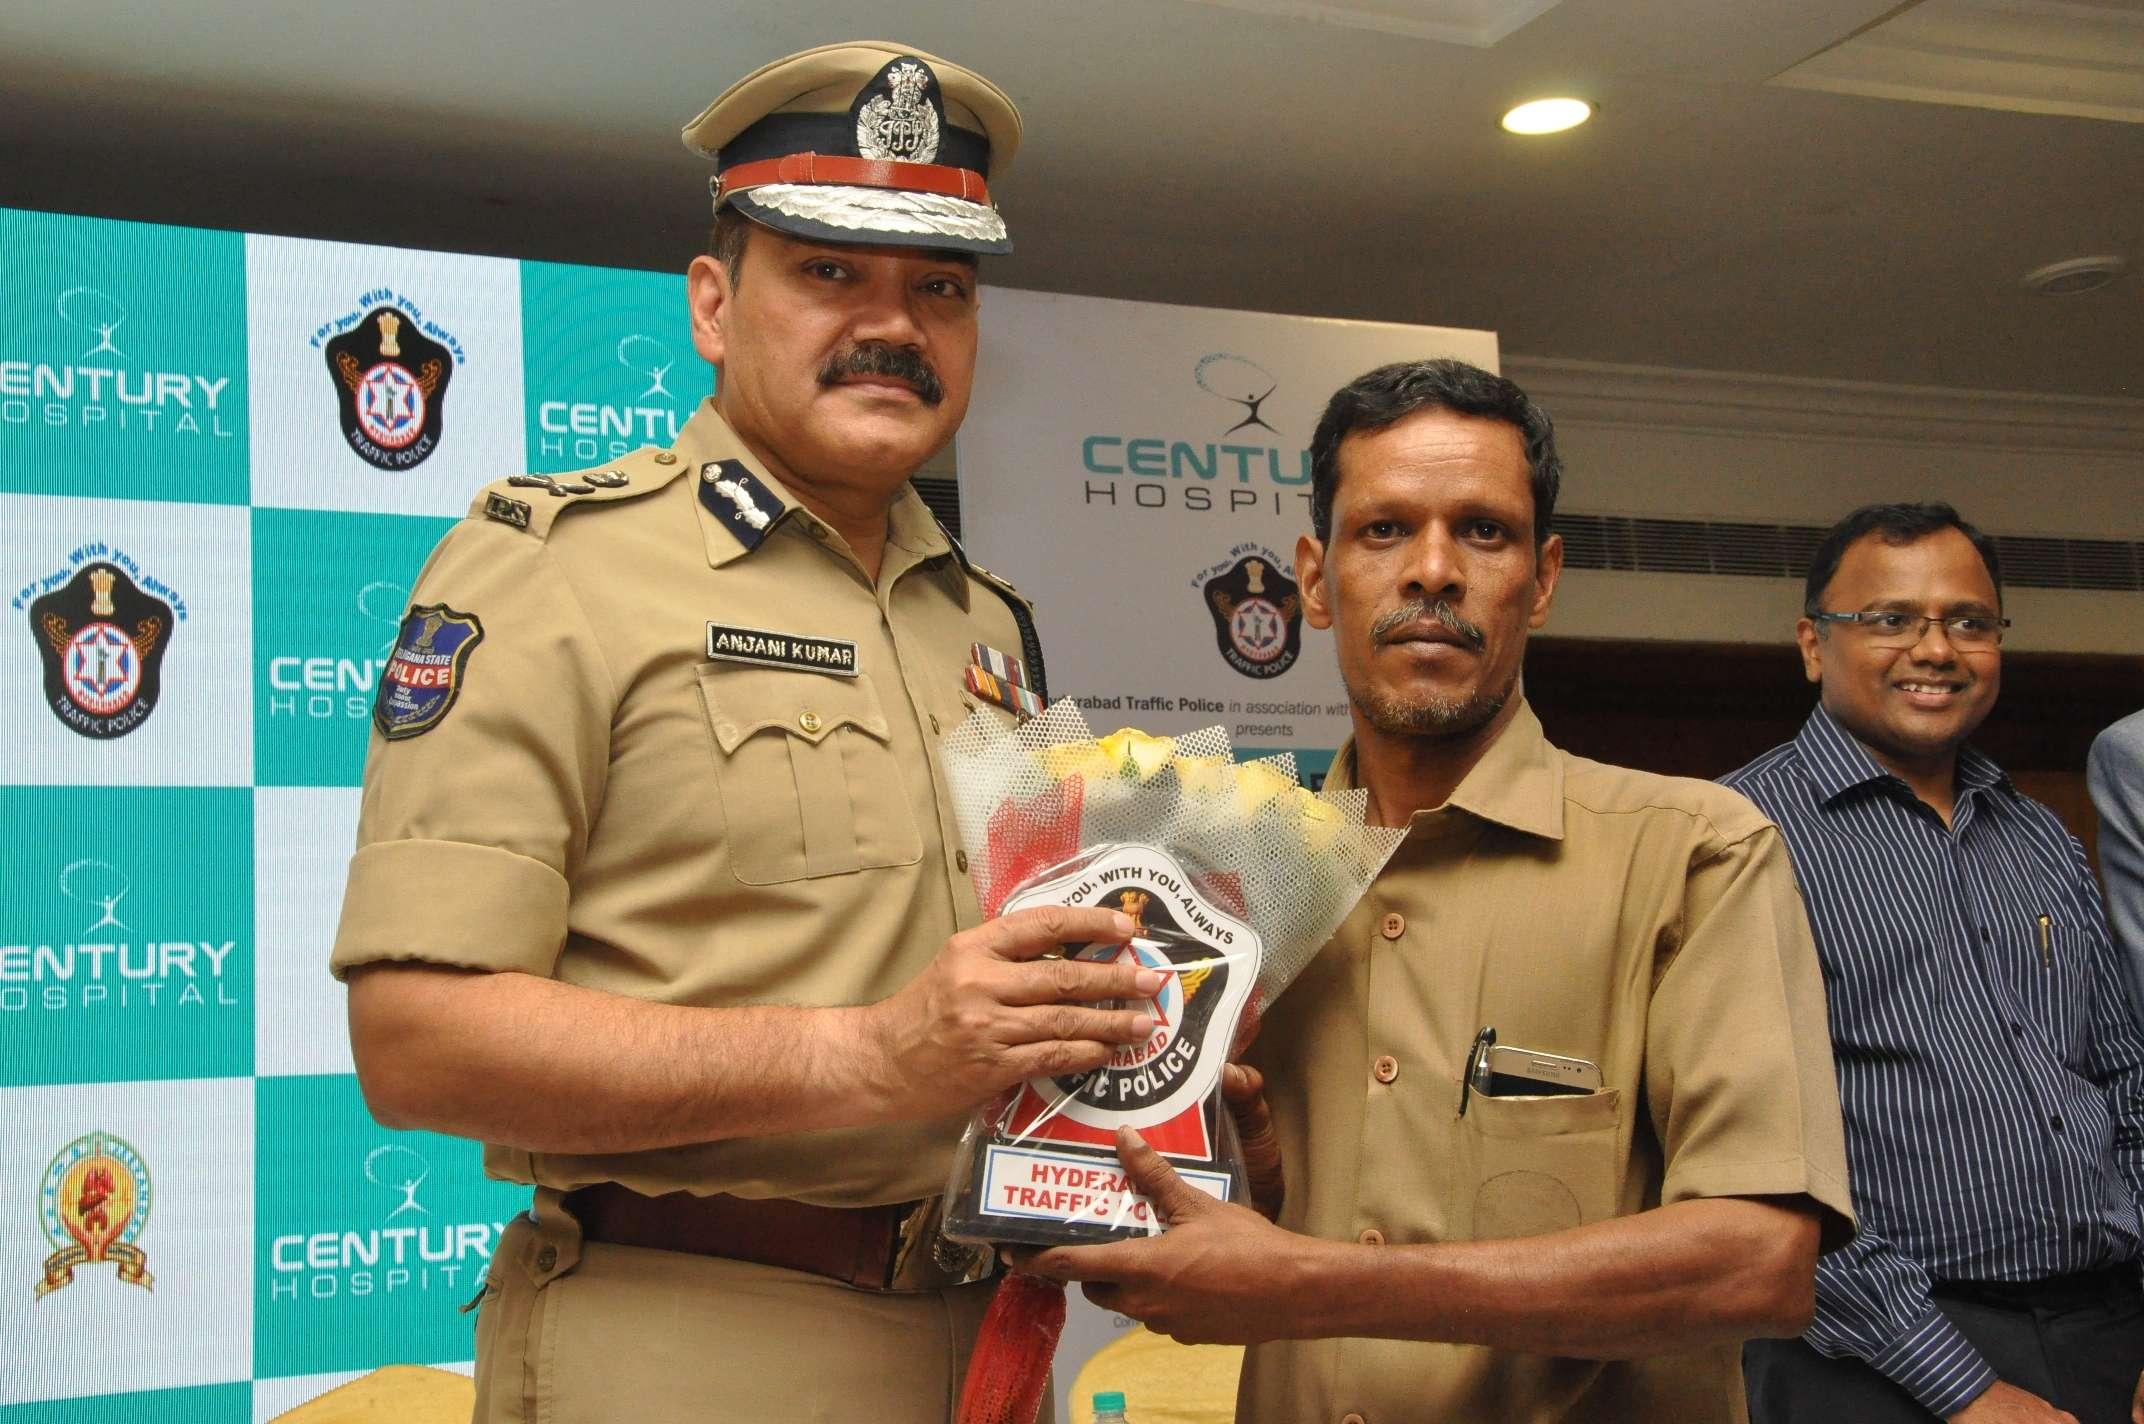 Shri. Anjani Kumar,IPS, Commissioner of Police, Hyderabad  falicitating the people who follows  traffic  rules